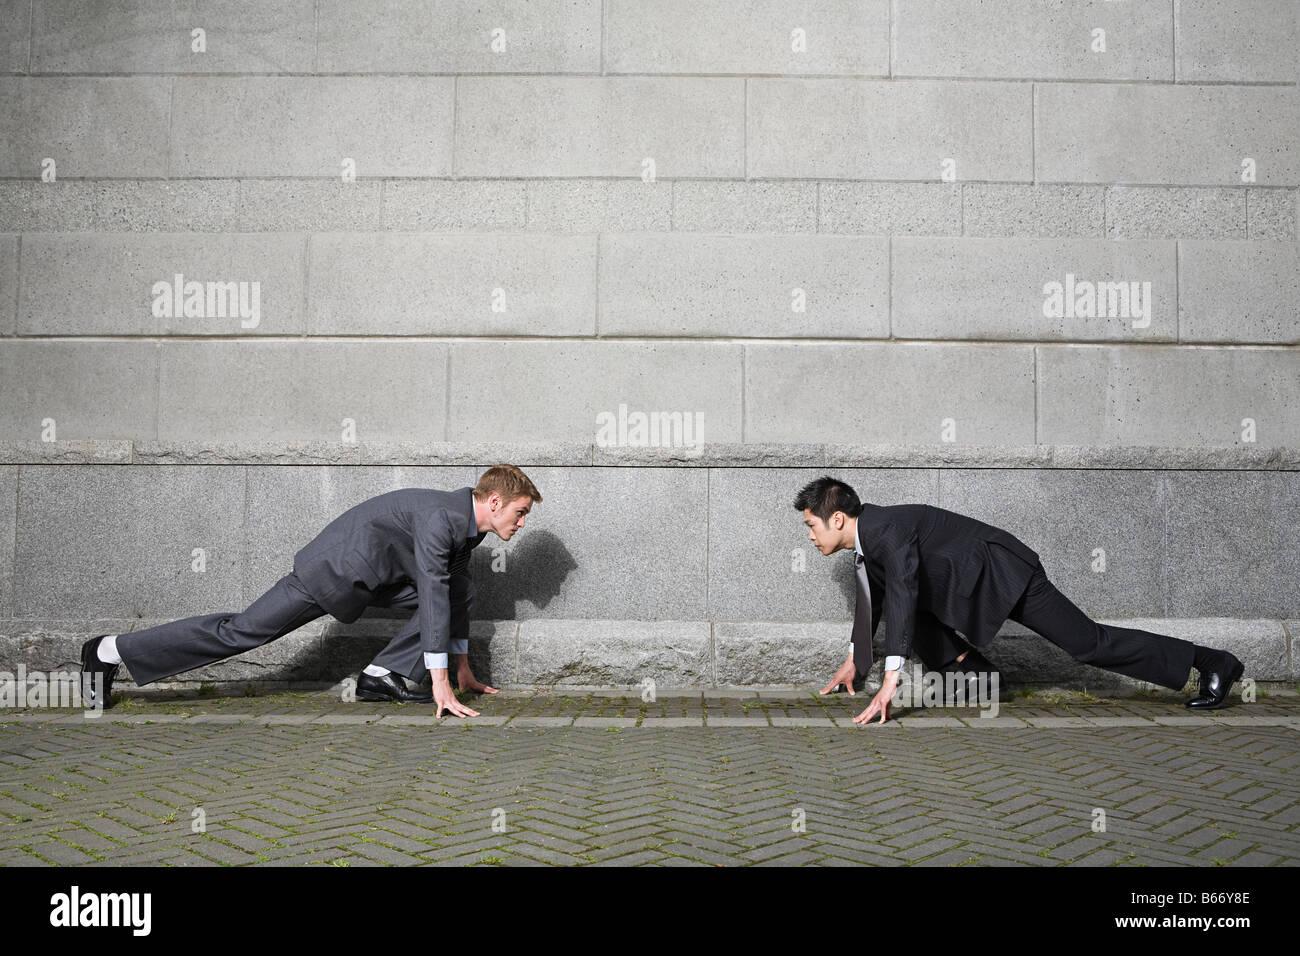 Rival businessmen - Stock Image